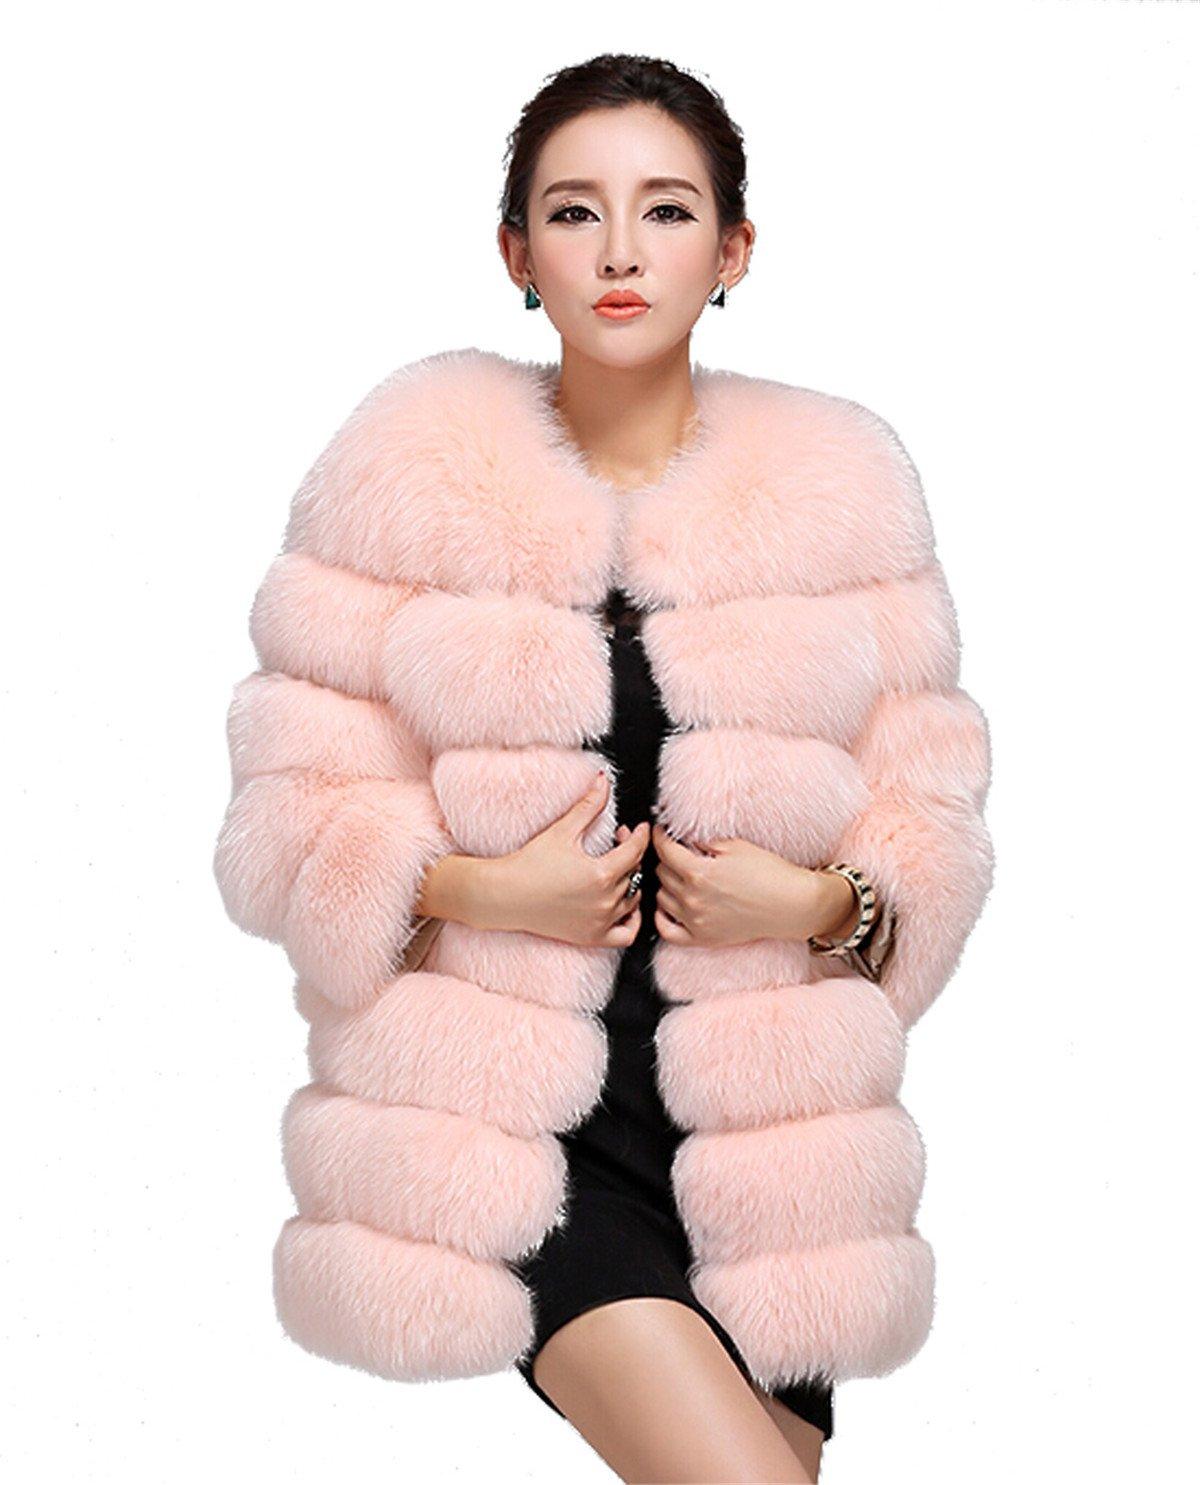 Top Fur Women's Genunine Fox Fur Whole Skins Eye-Catching Coat- INDIPINK, US 10